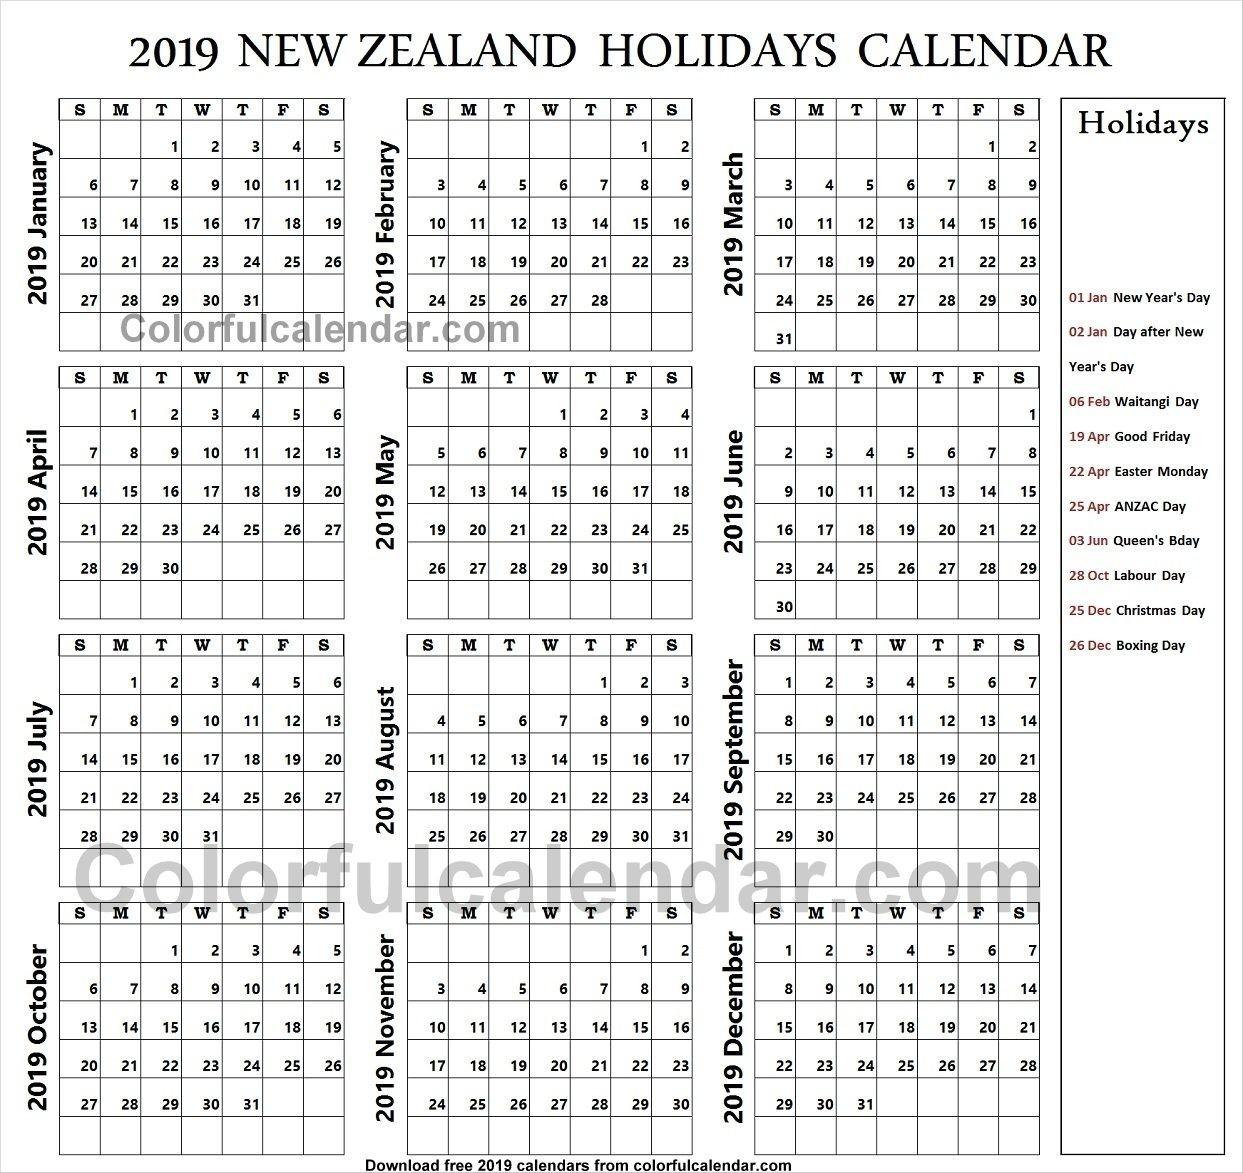 2019 School Holidays New Zealand Calendar | School Holidays-School Holidays Nz Calendar